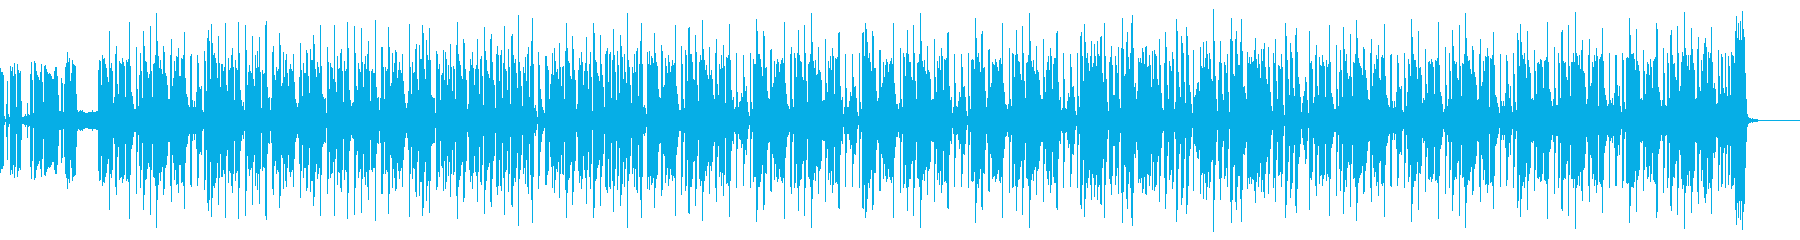 70sディスコノリノリグルーヴ!の再生済みの波形